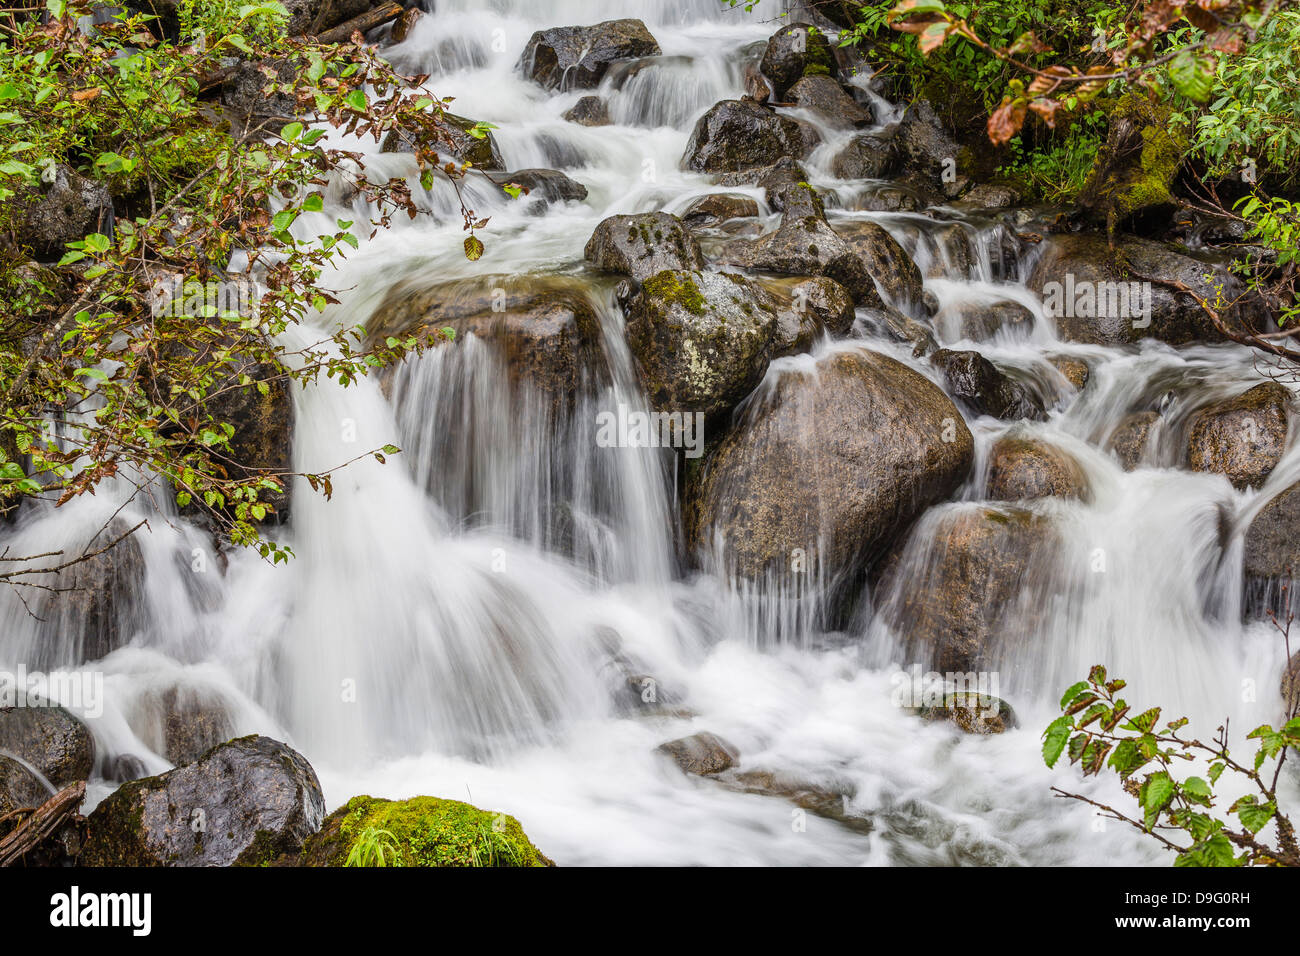 Small waterfall near Mendenhall Glacier, Southeast Alaska, USA - Stock Image